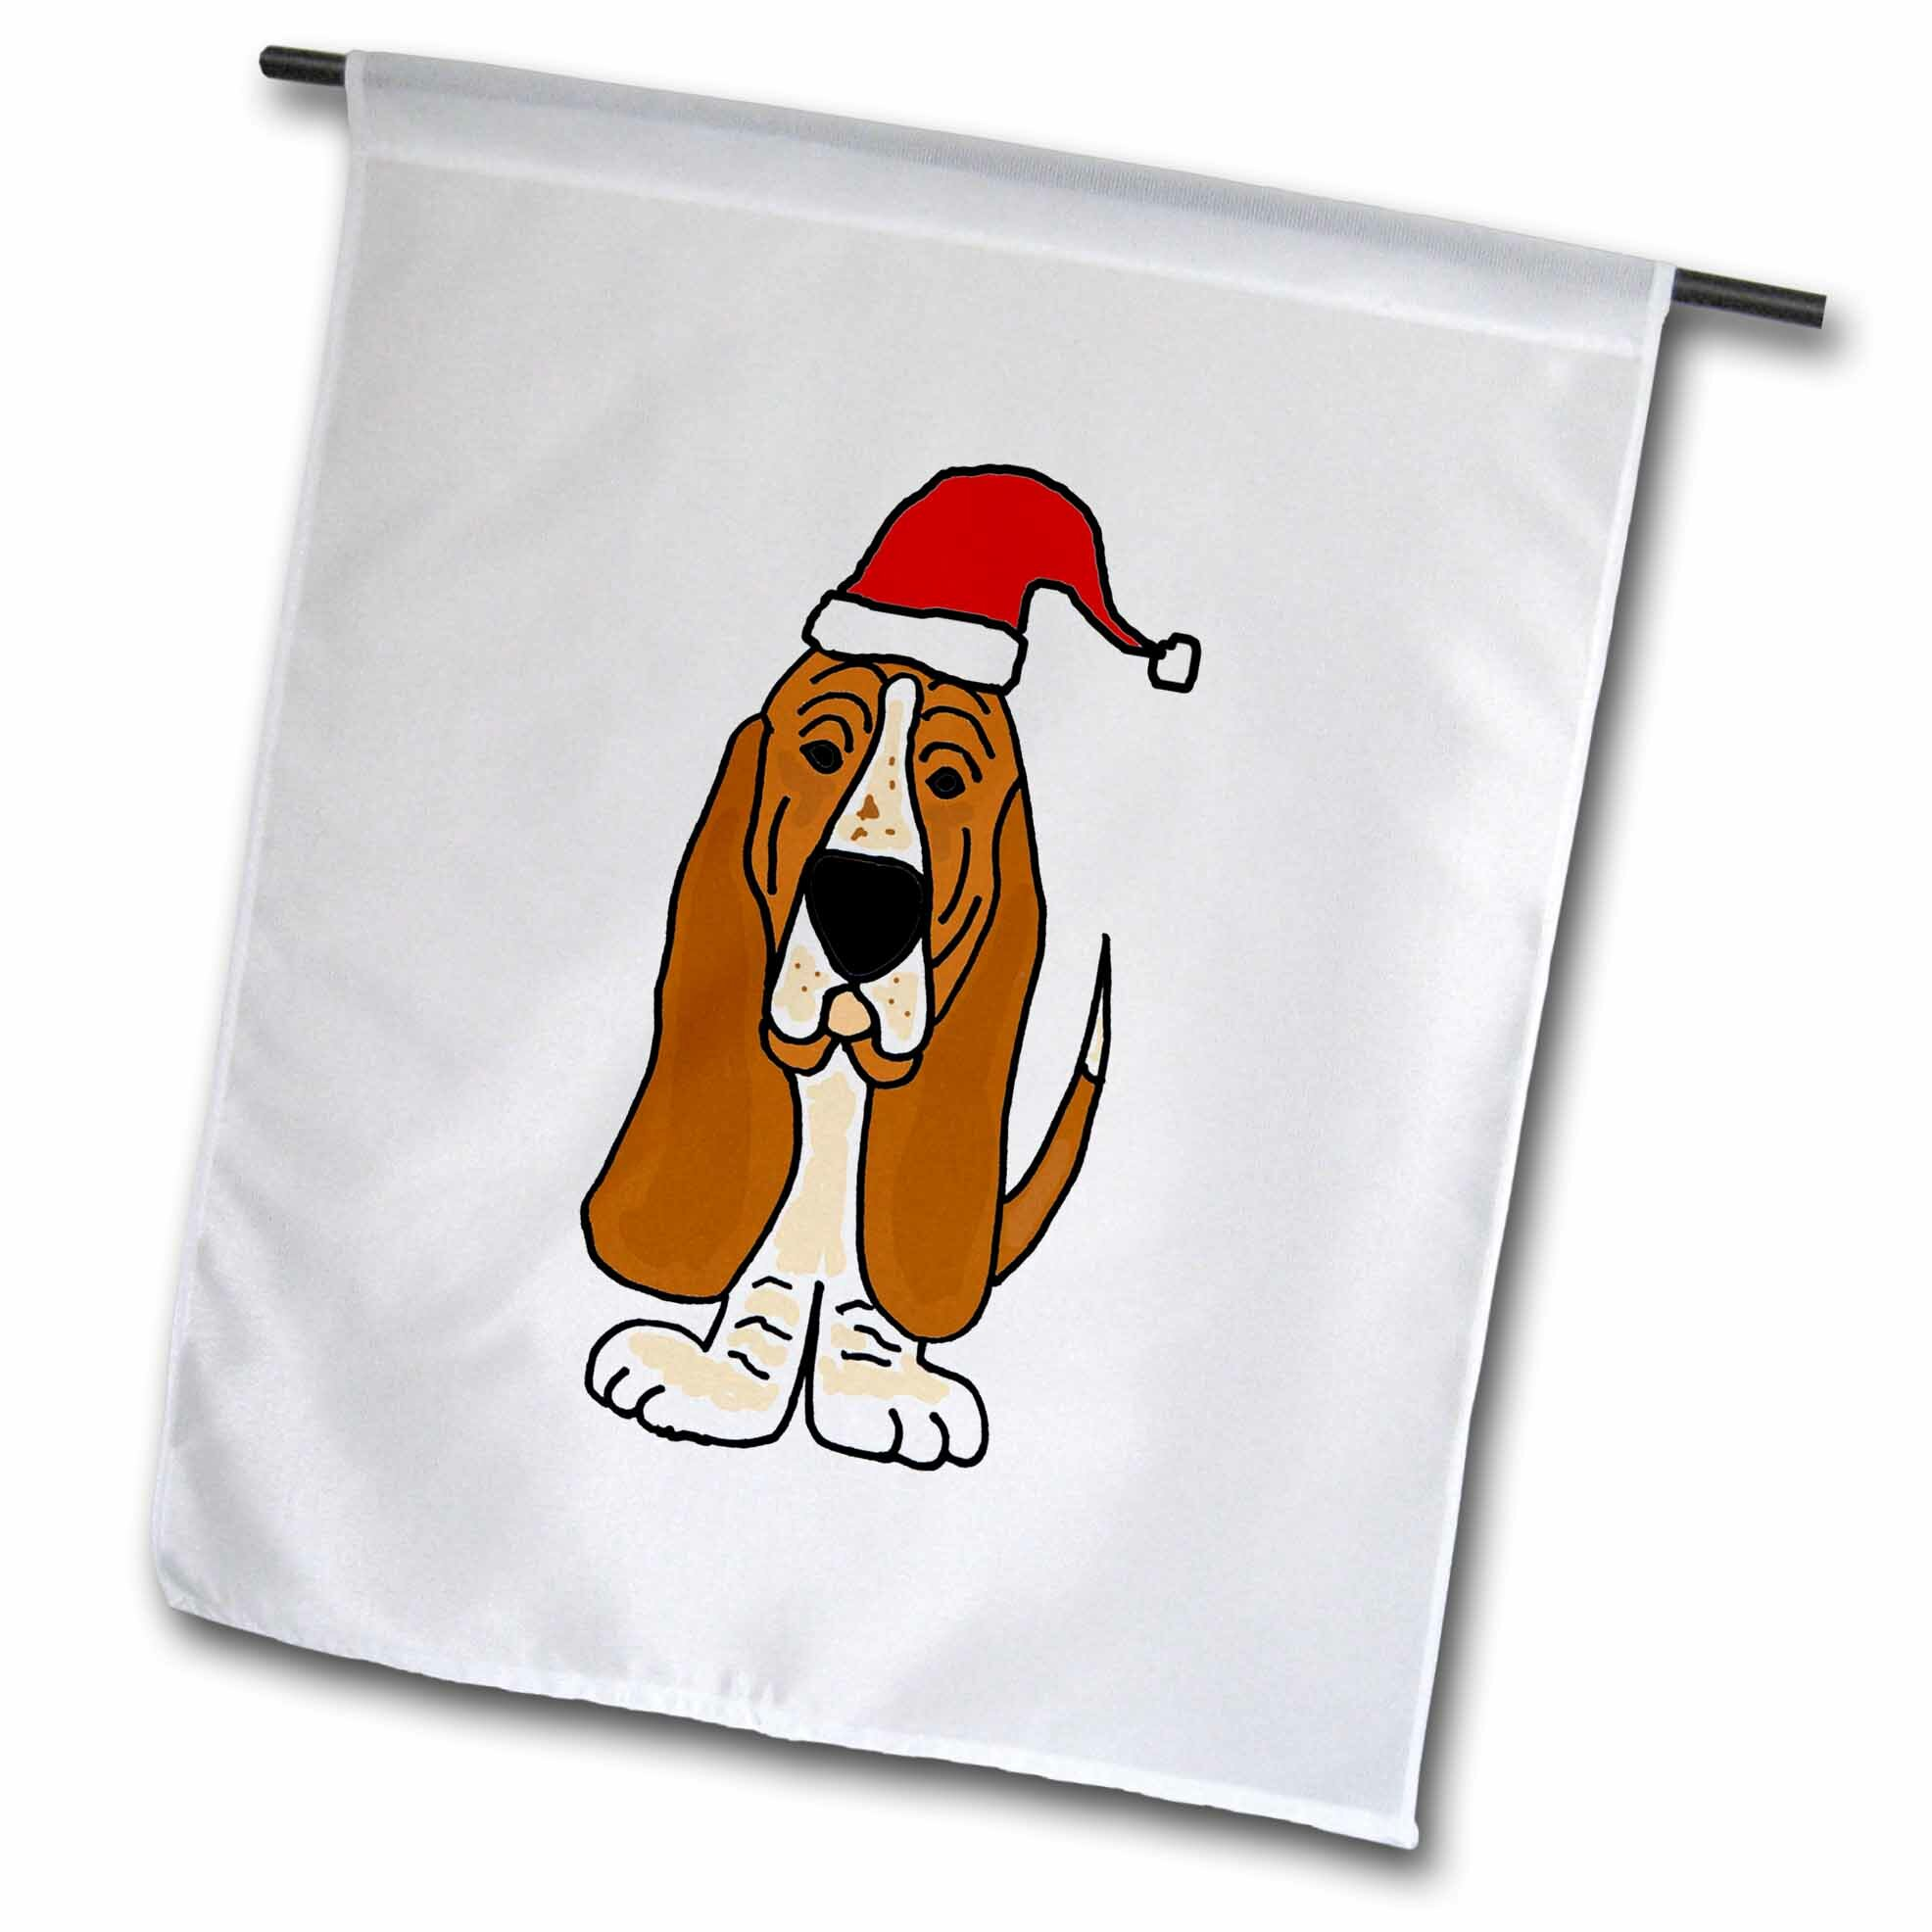 3drose Funny Basset Hound Puppy Dog In Santa Claus Hat Polyester Garden Flag